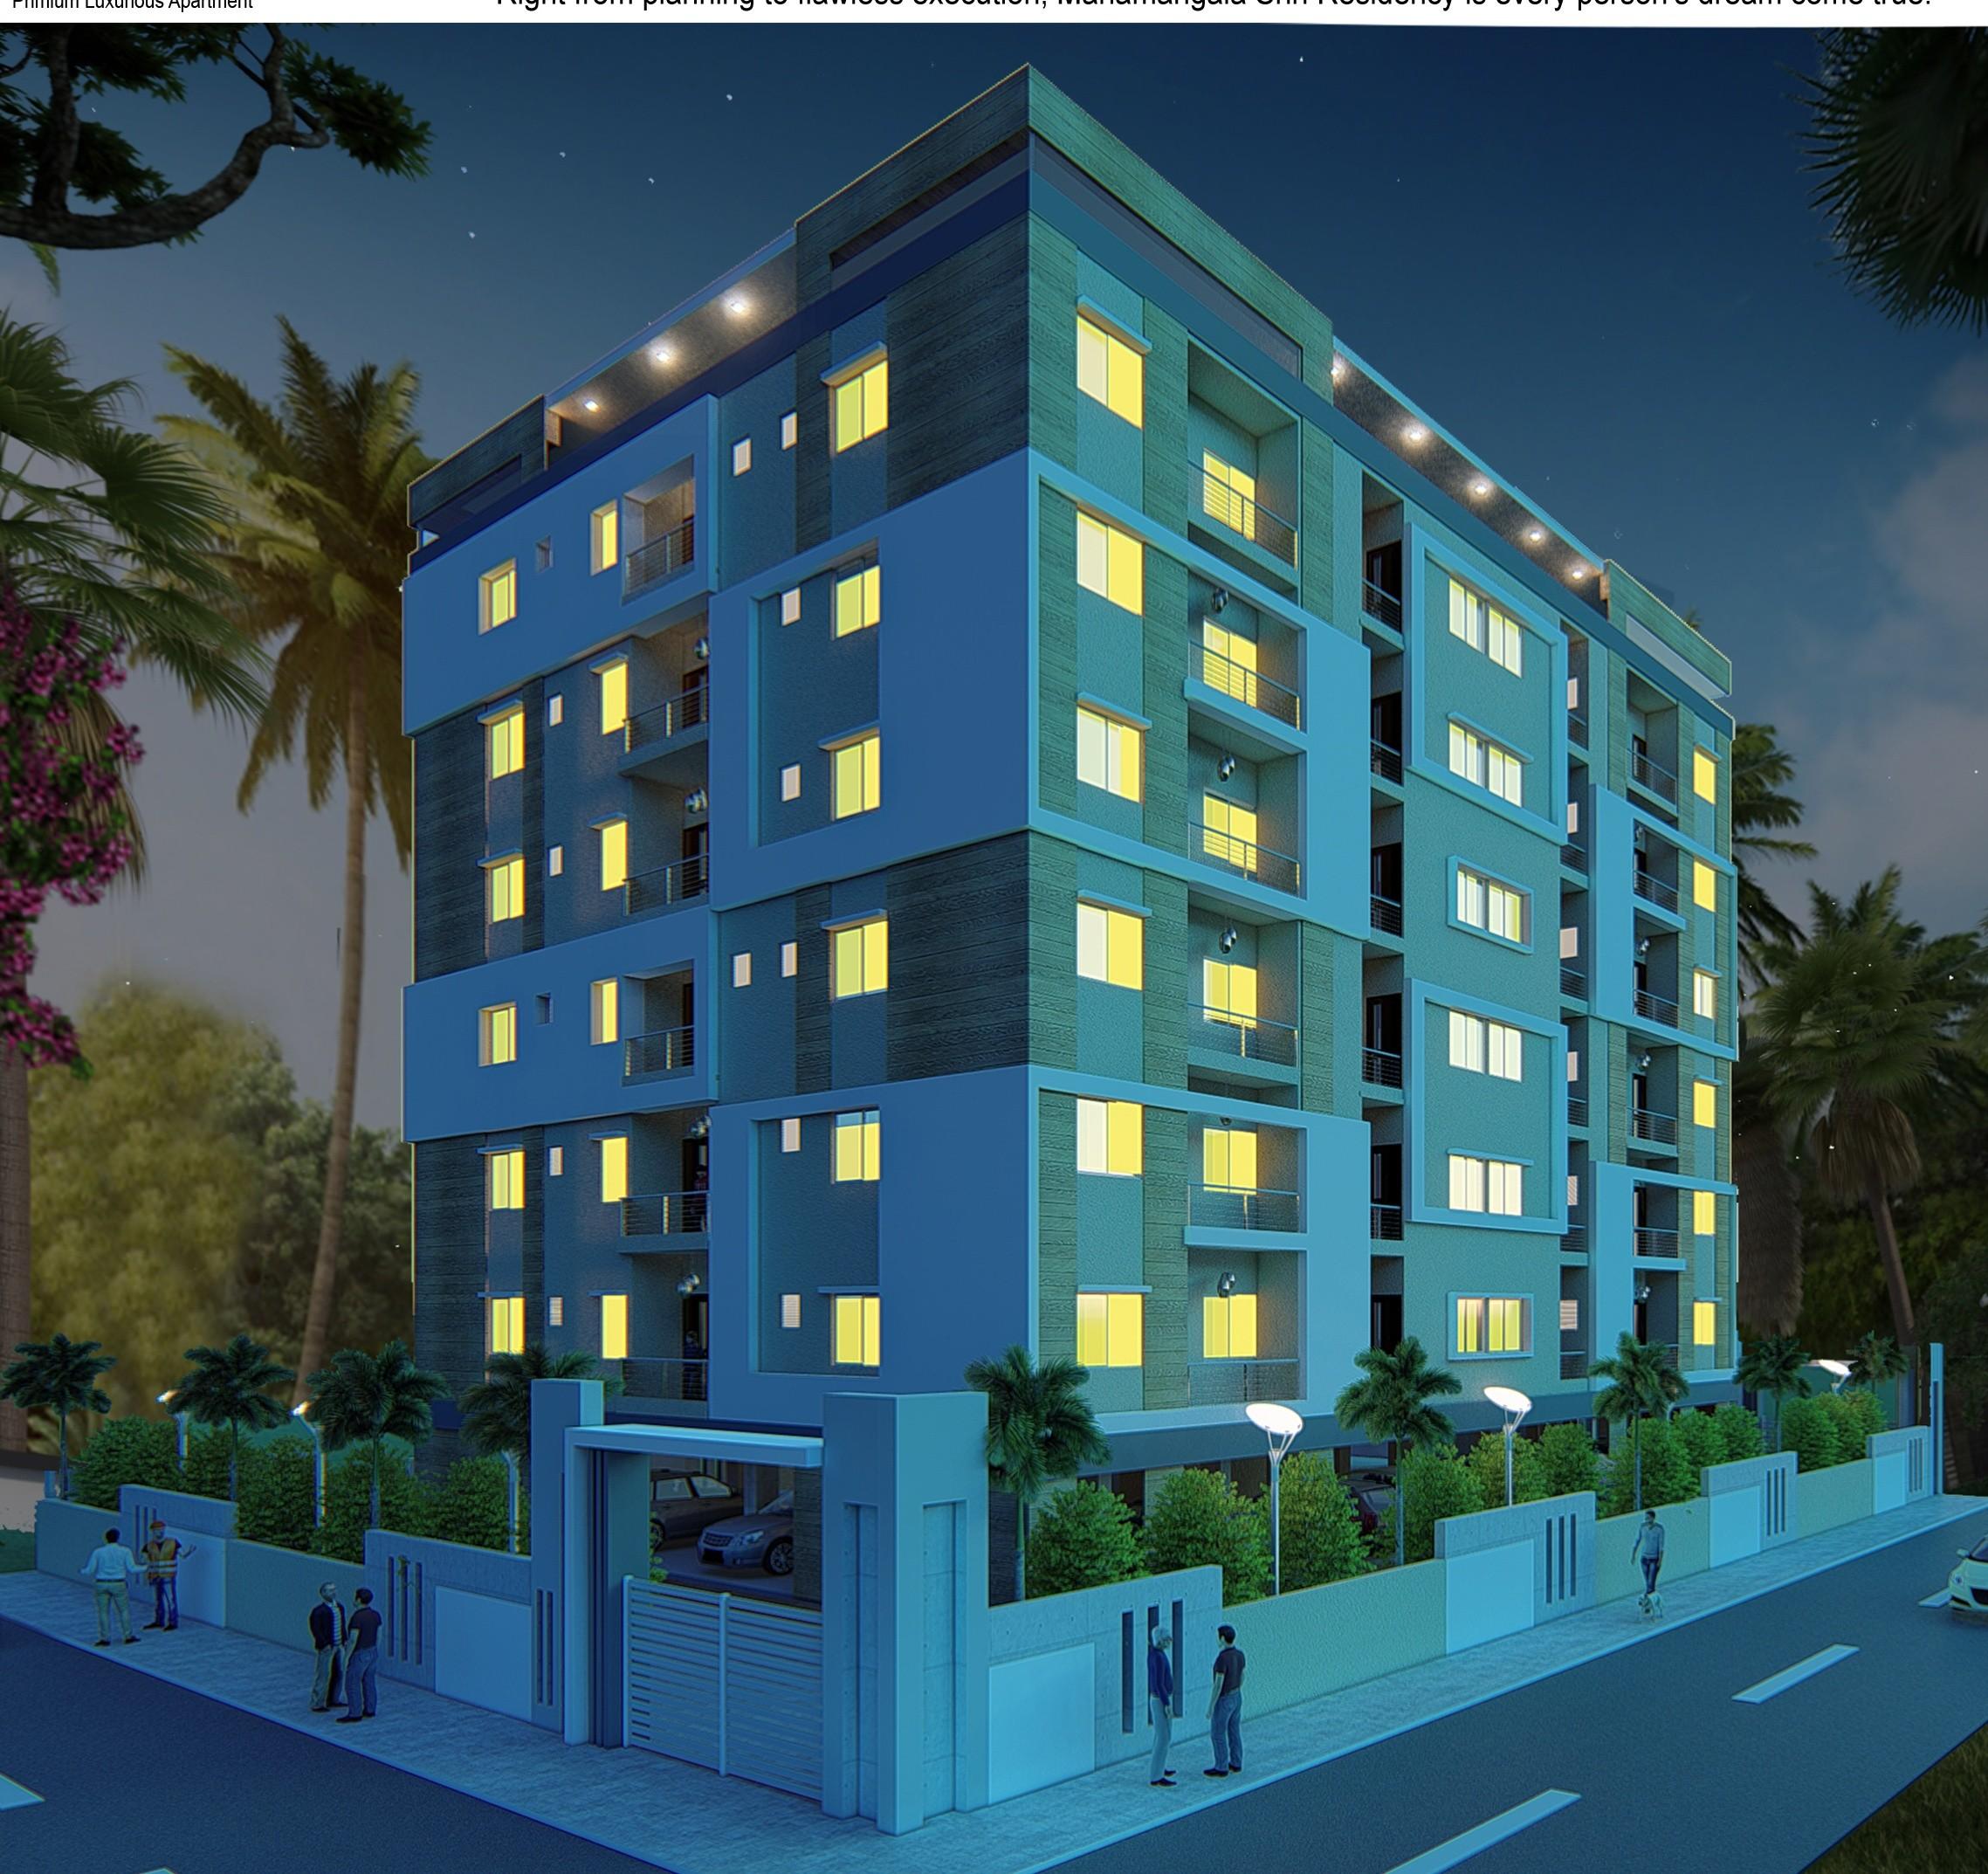 Residential Projects of Shankar Singh Rajput | ZingyHomes